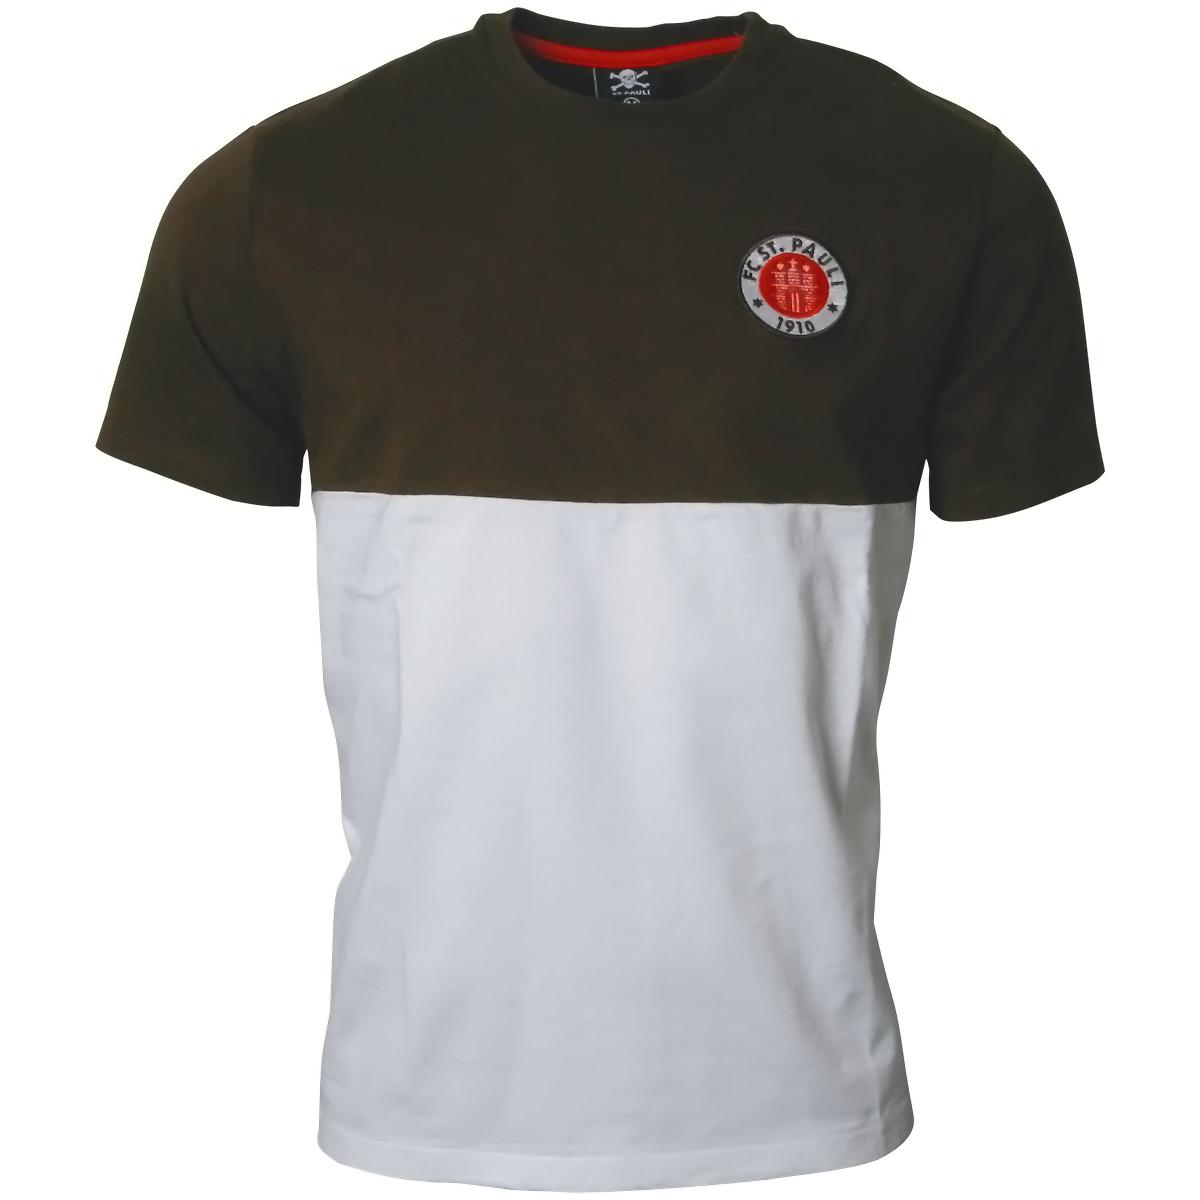 6e14e515477b0 FC St. Pauli - weiß/braunes T-Shirt mit Logo Design | ROCKnSHOP